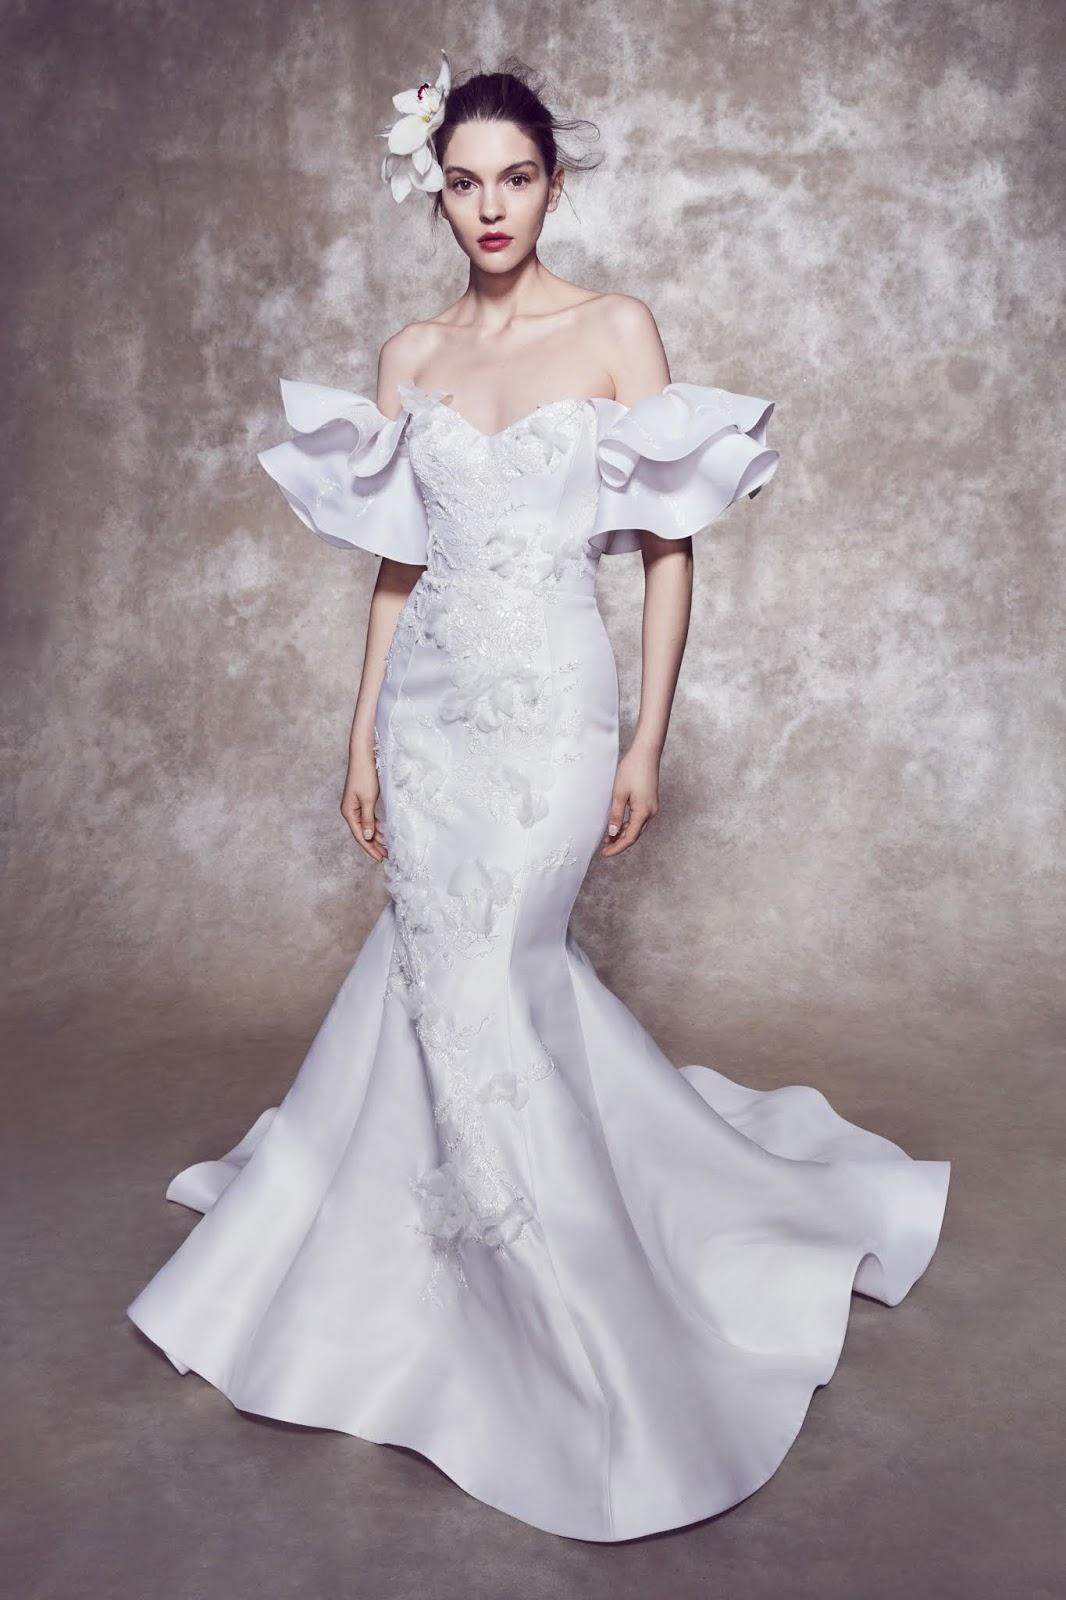 786987eadc45 Wedding Gown Inspiration | ZsaZsa Bellagio – Like No Other